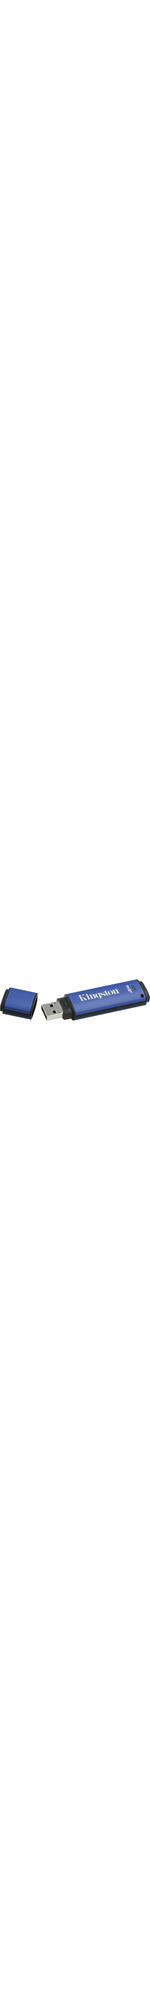 Kingston DataTraveler Vault 4 GB USB 3.0 Flash Drive